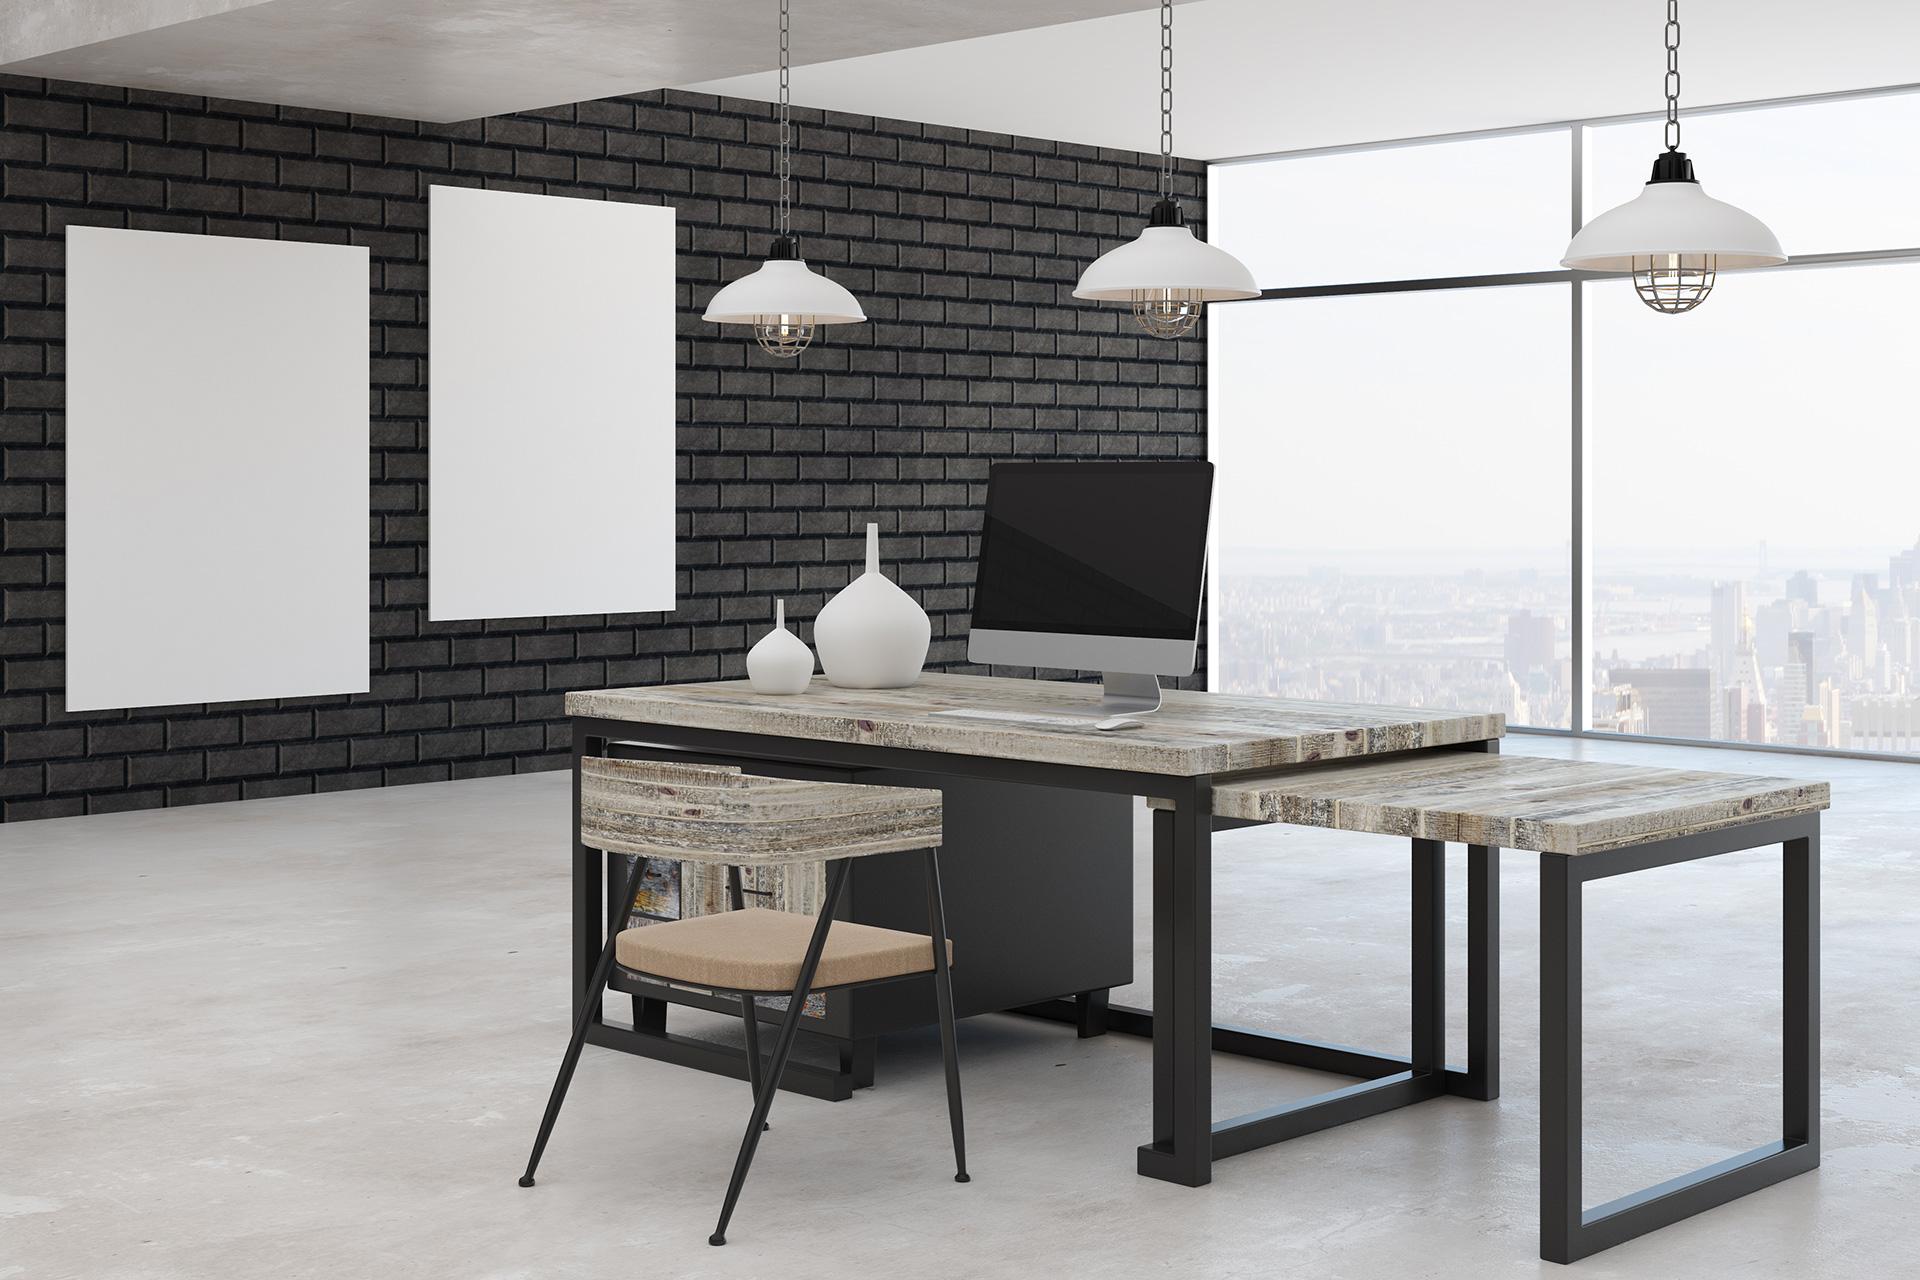 remarkable glassboards glaspro installation 06 x2